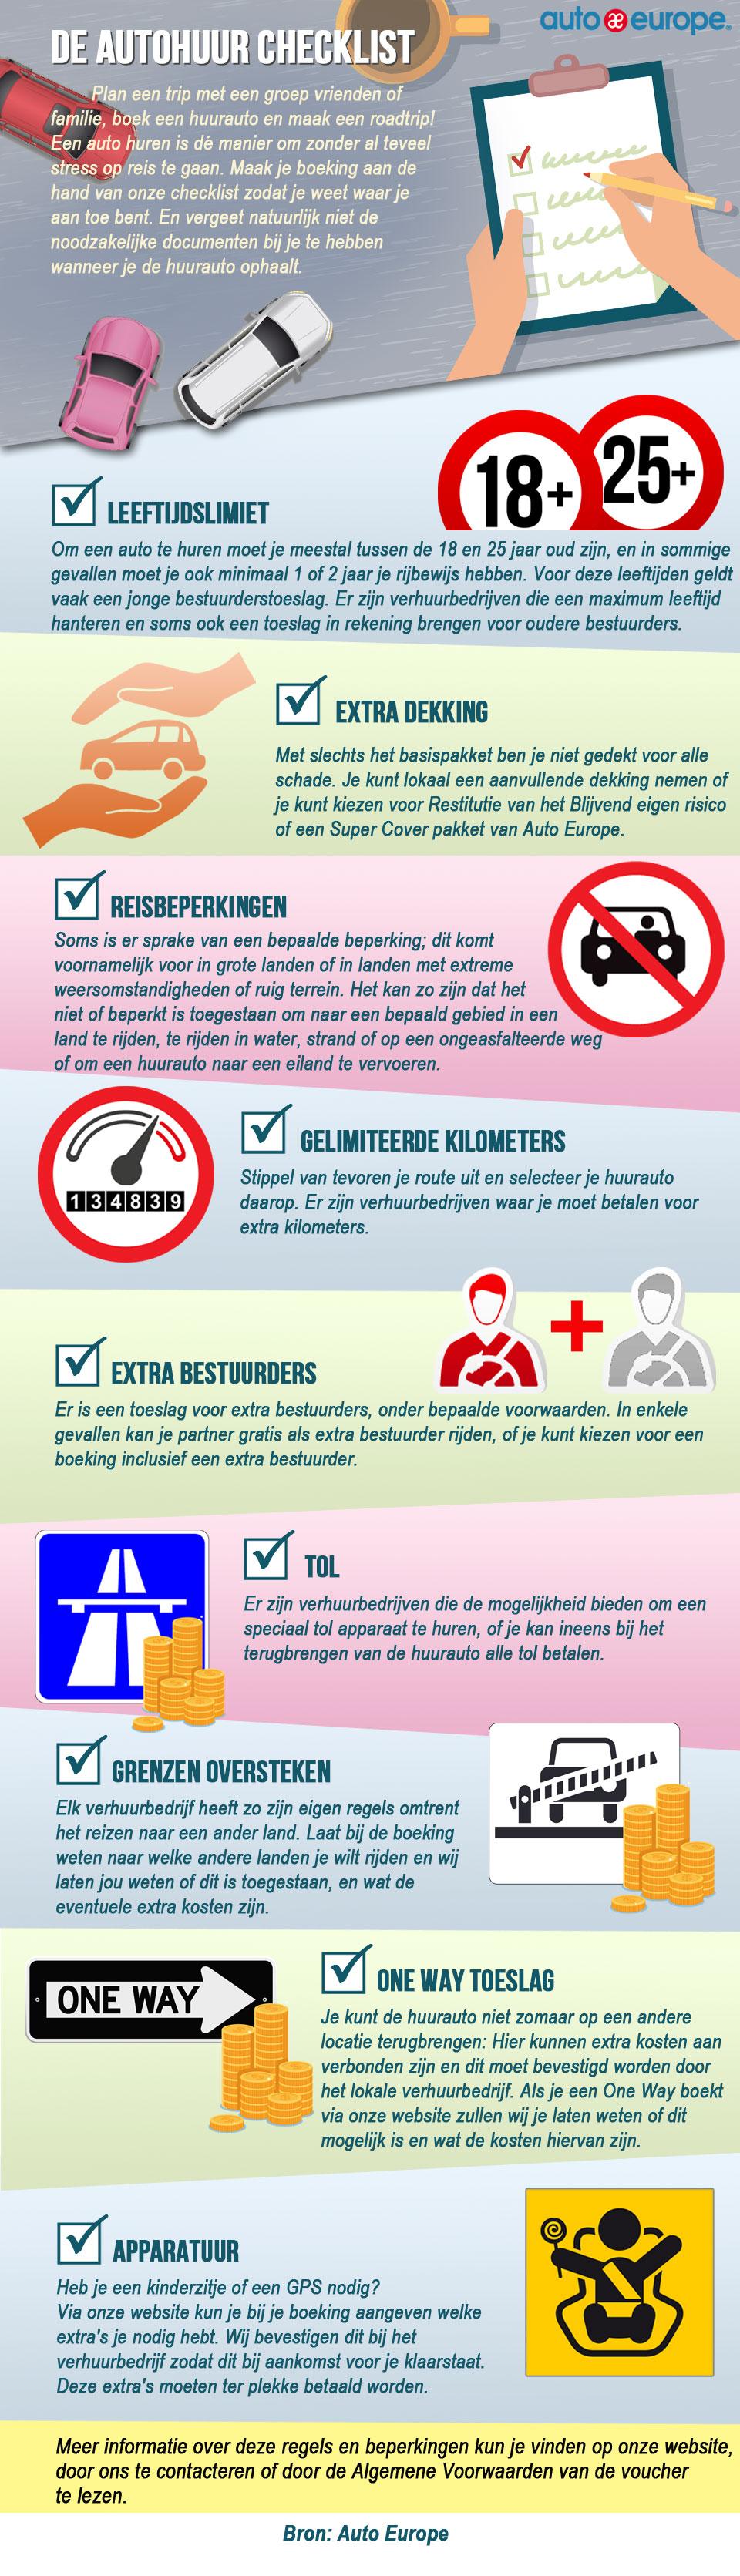 Infographic: Autohuur checklist